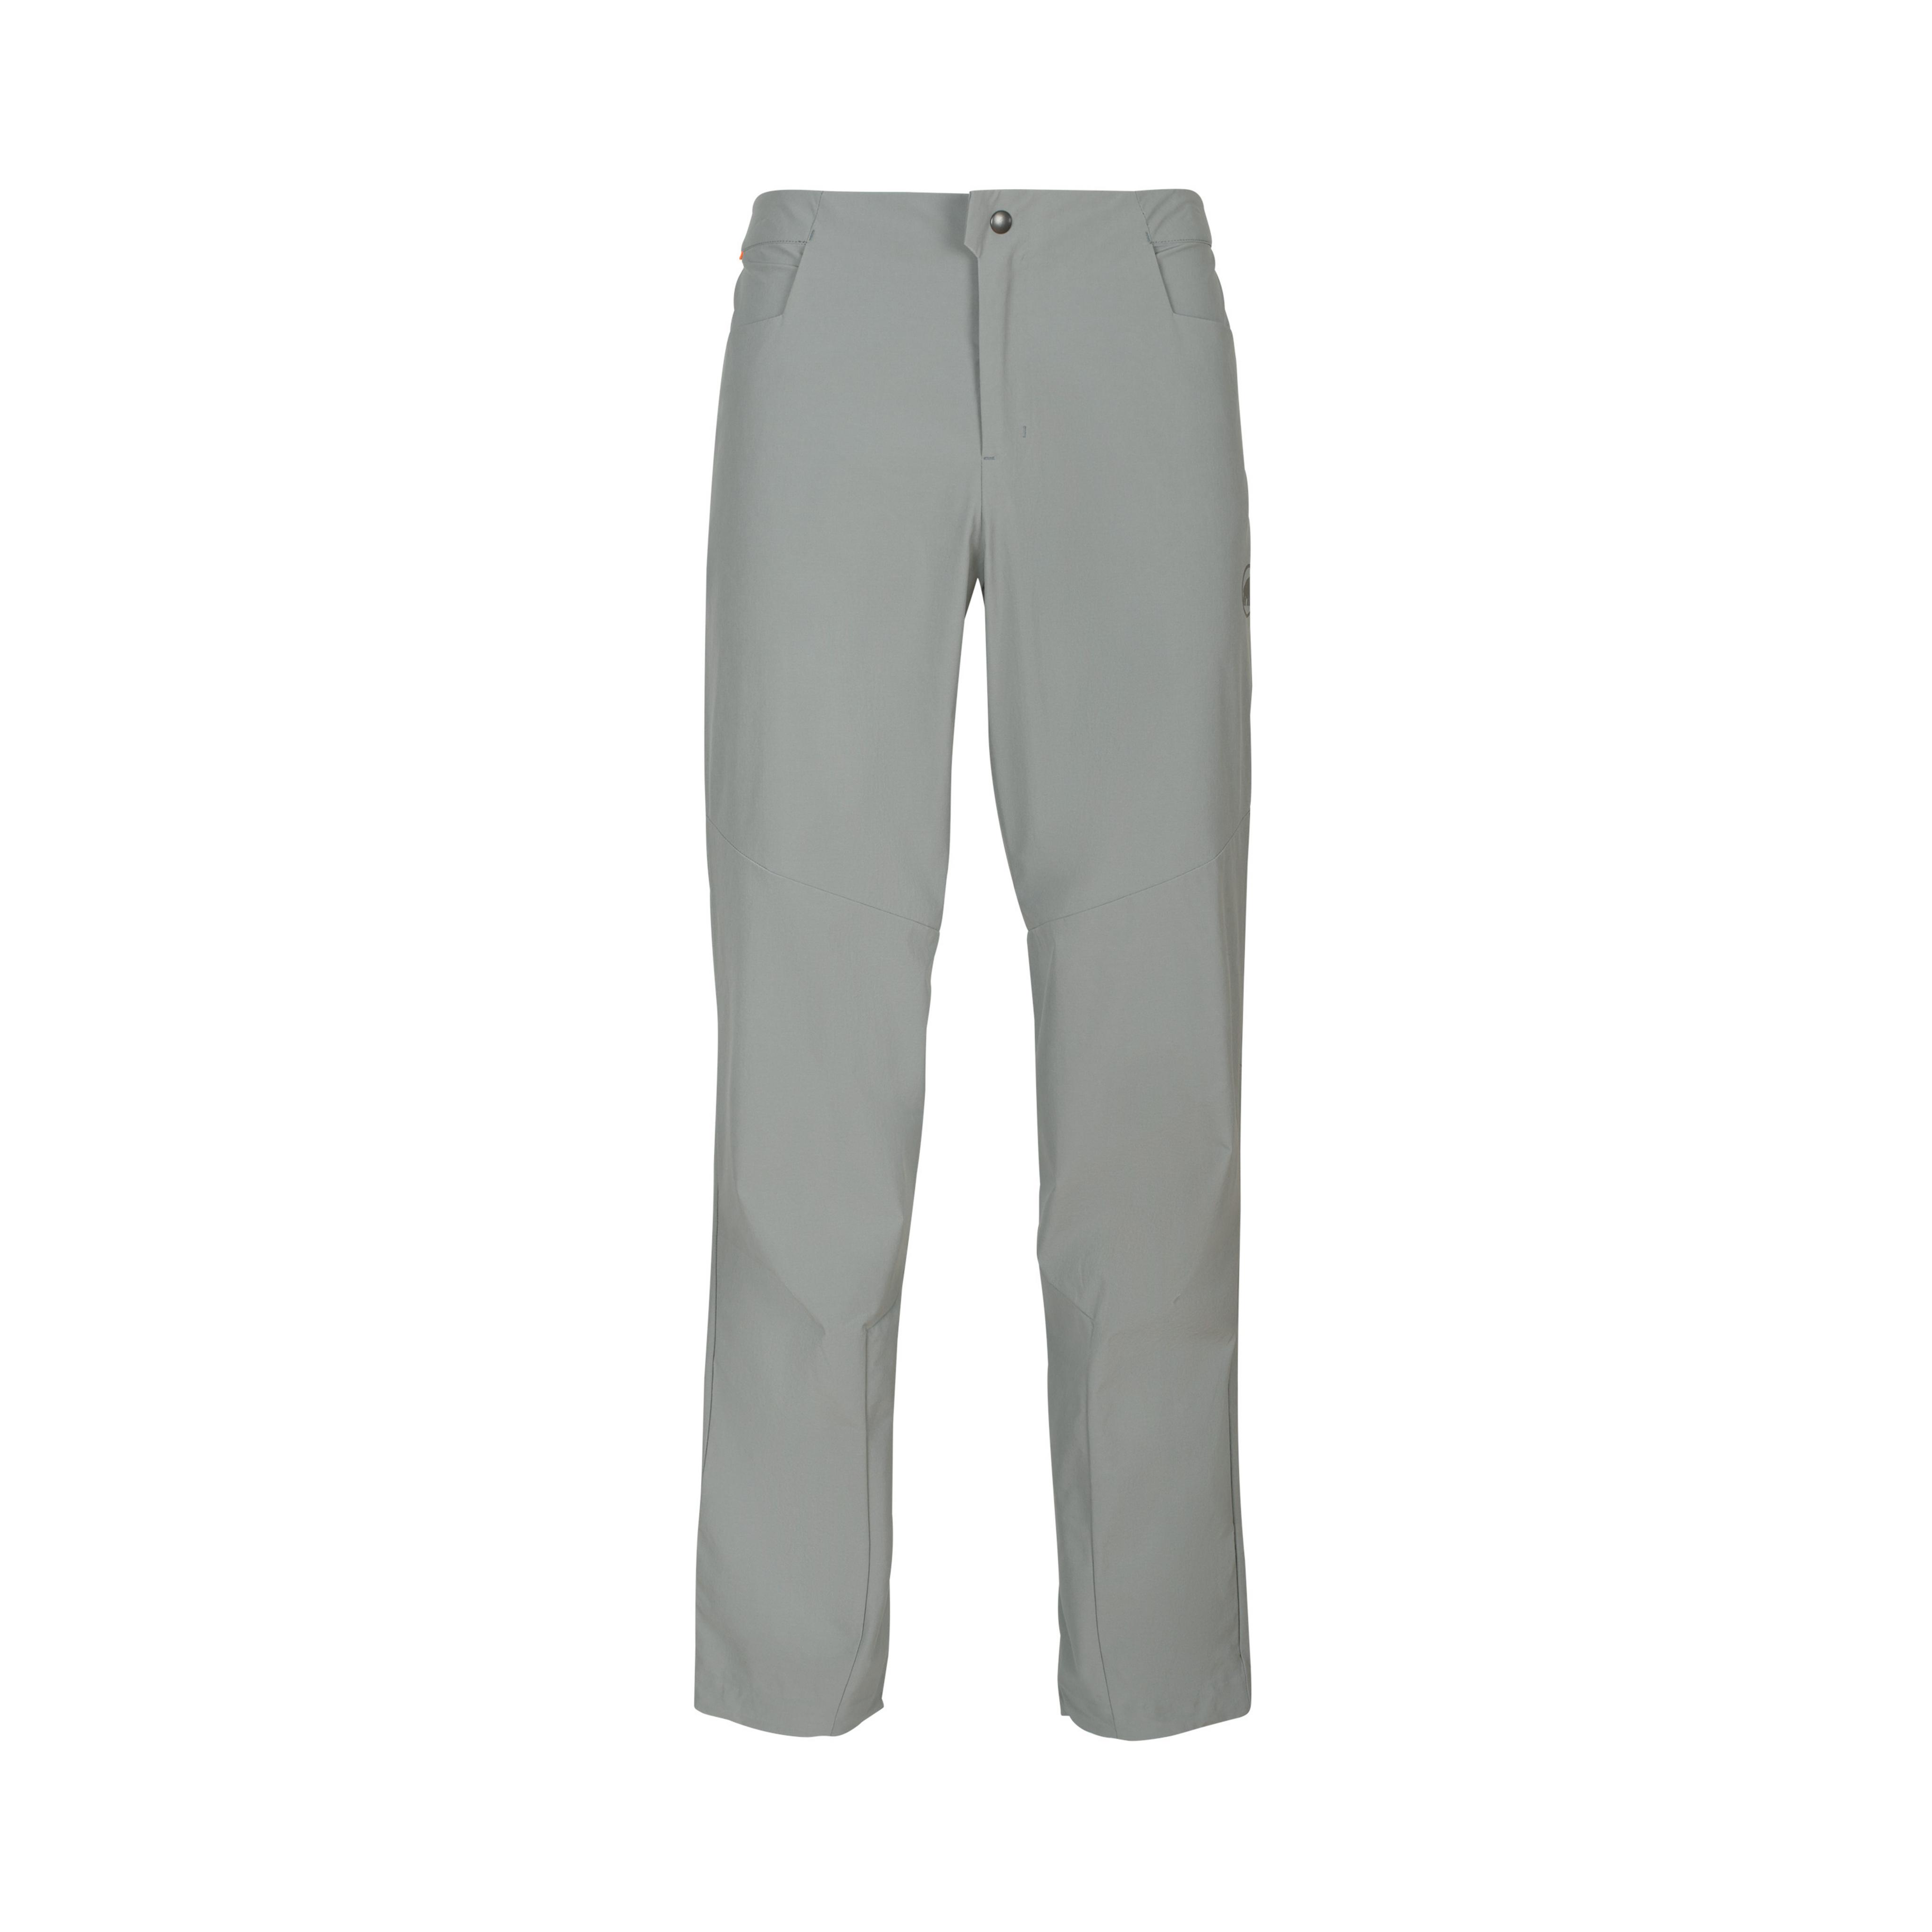 Massone Pants Men - granit, normal, UK 28 thumbnail